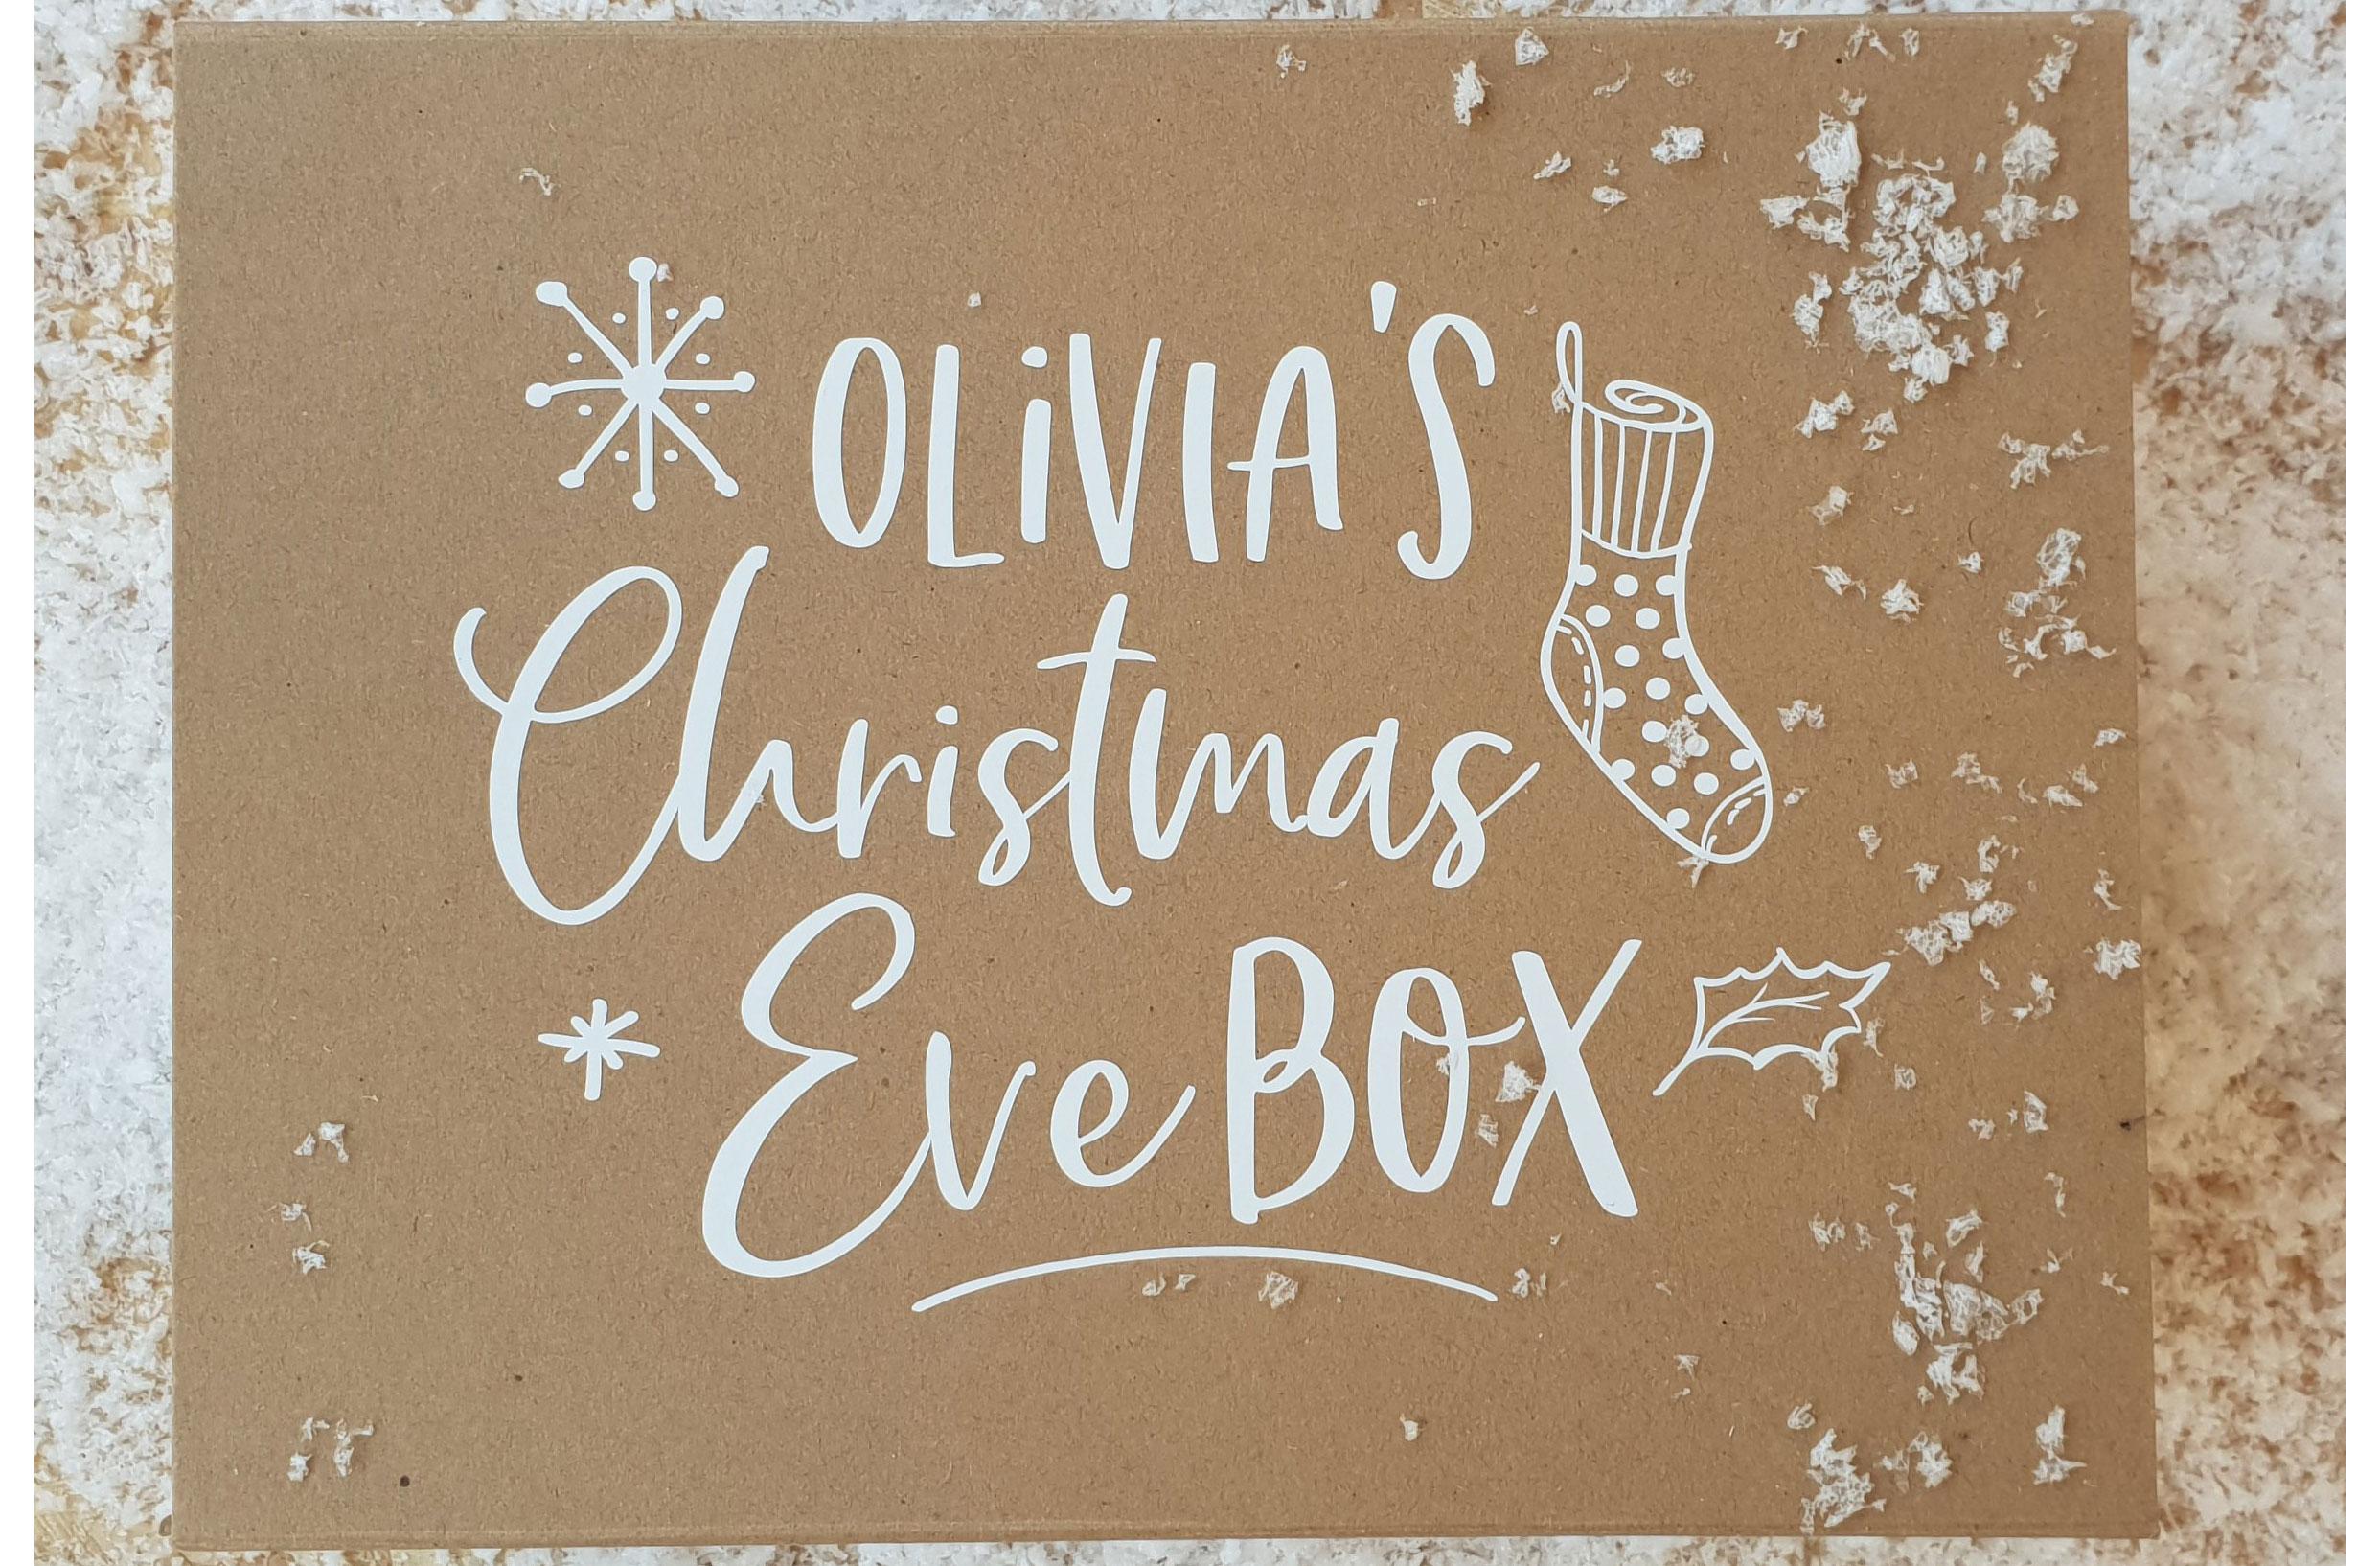 Christmas Eve Boxes How To Make A Christmas Eve Box